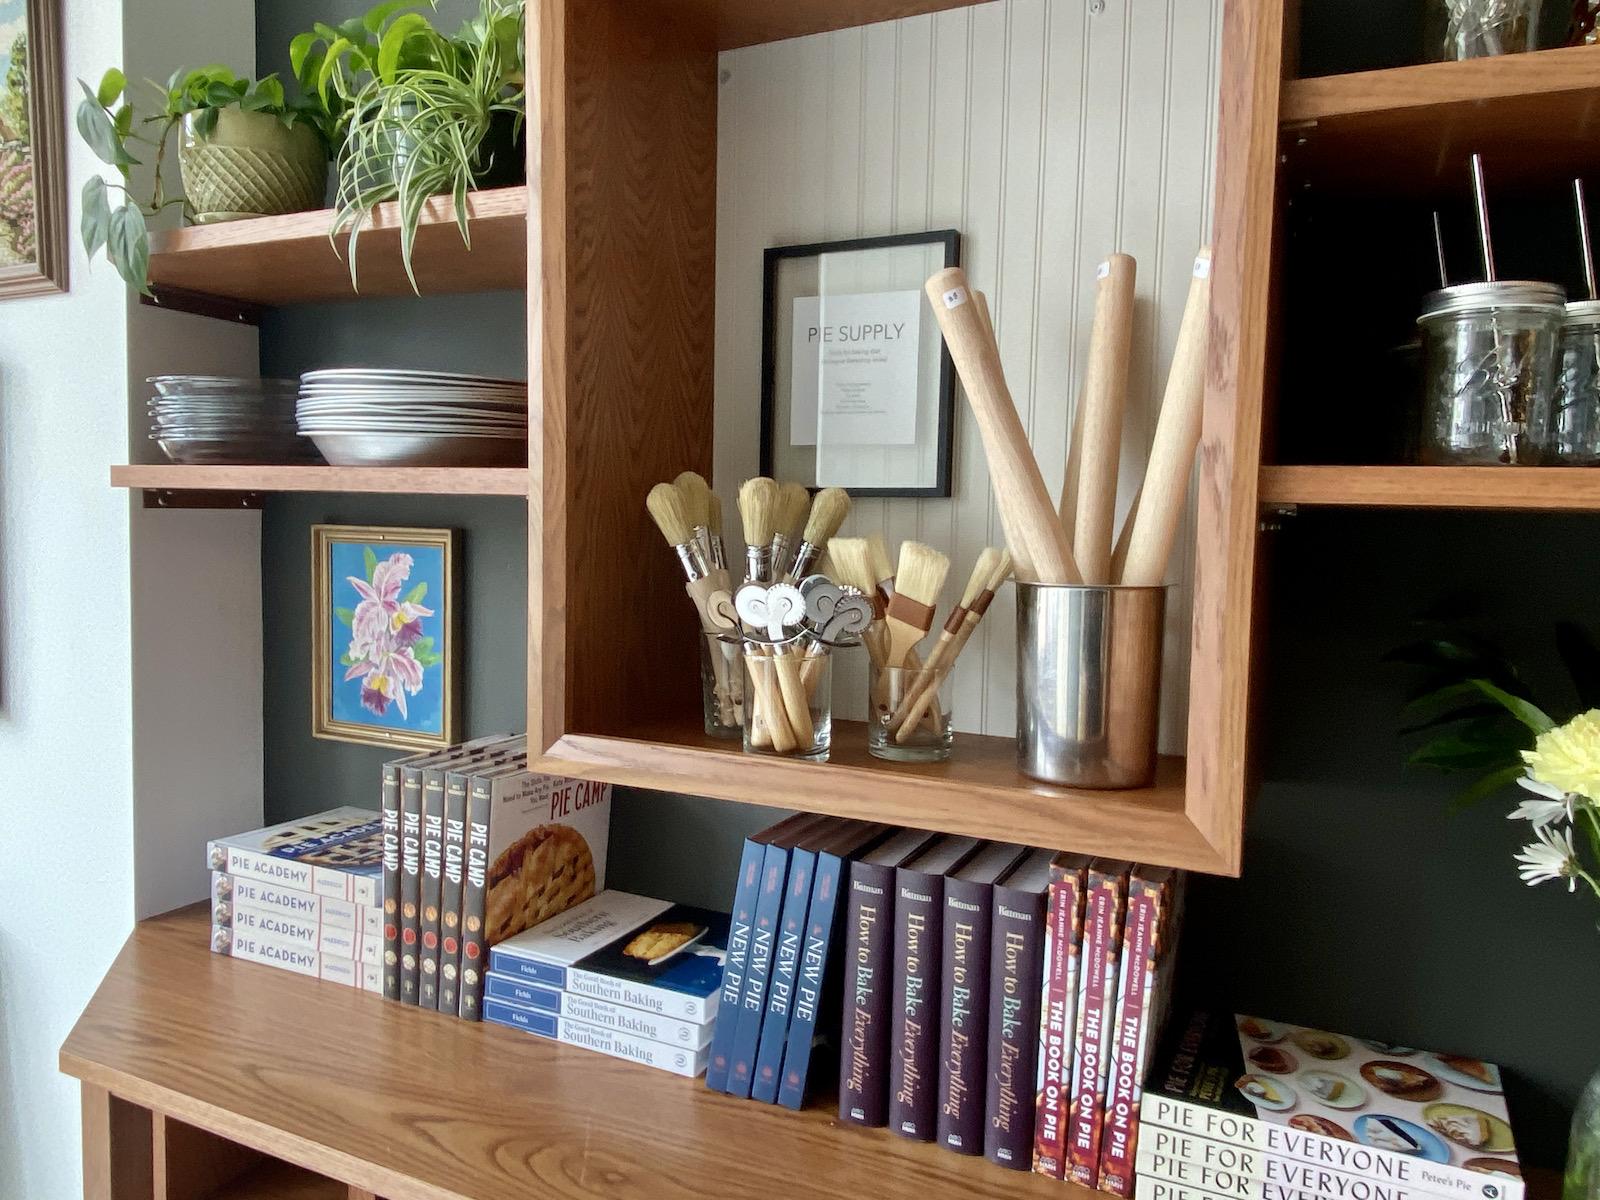 Pie supplies, cookbooks, plants on shelves